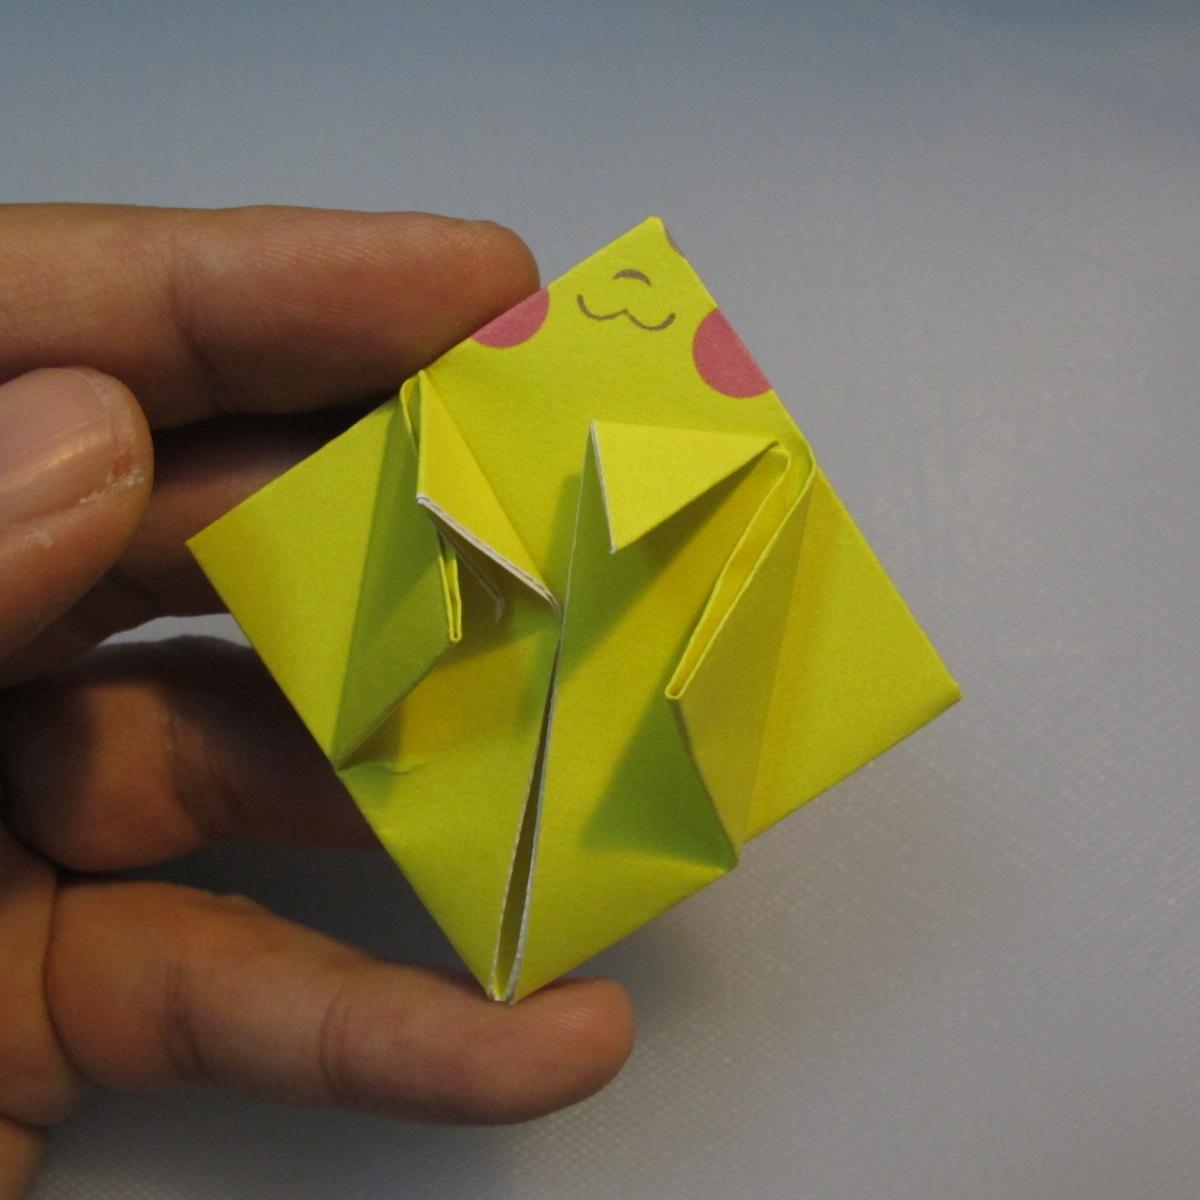 mookeep-วิธีพับกระดาษเป็นรูปปิกาจู-01-012